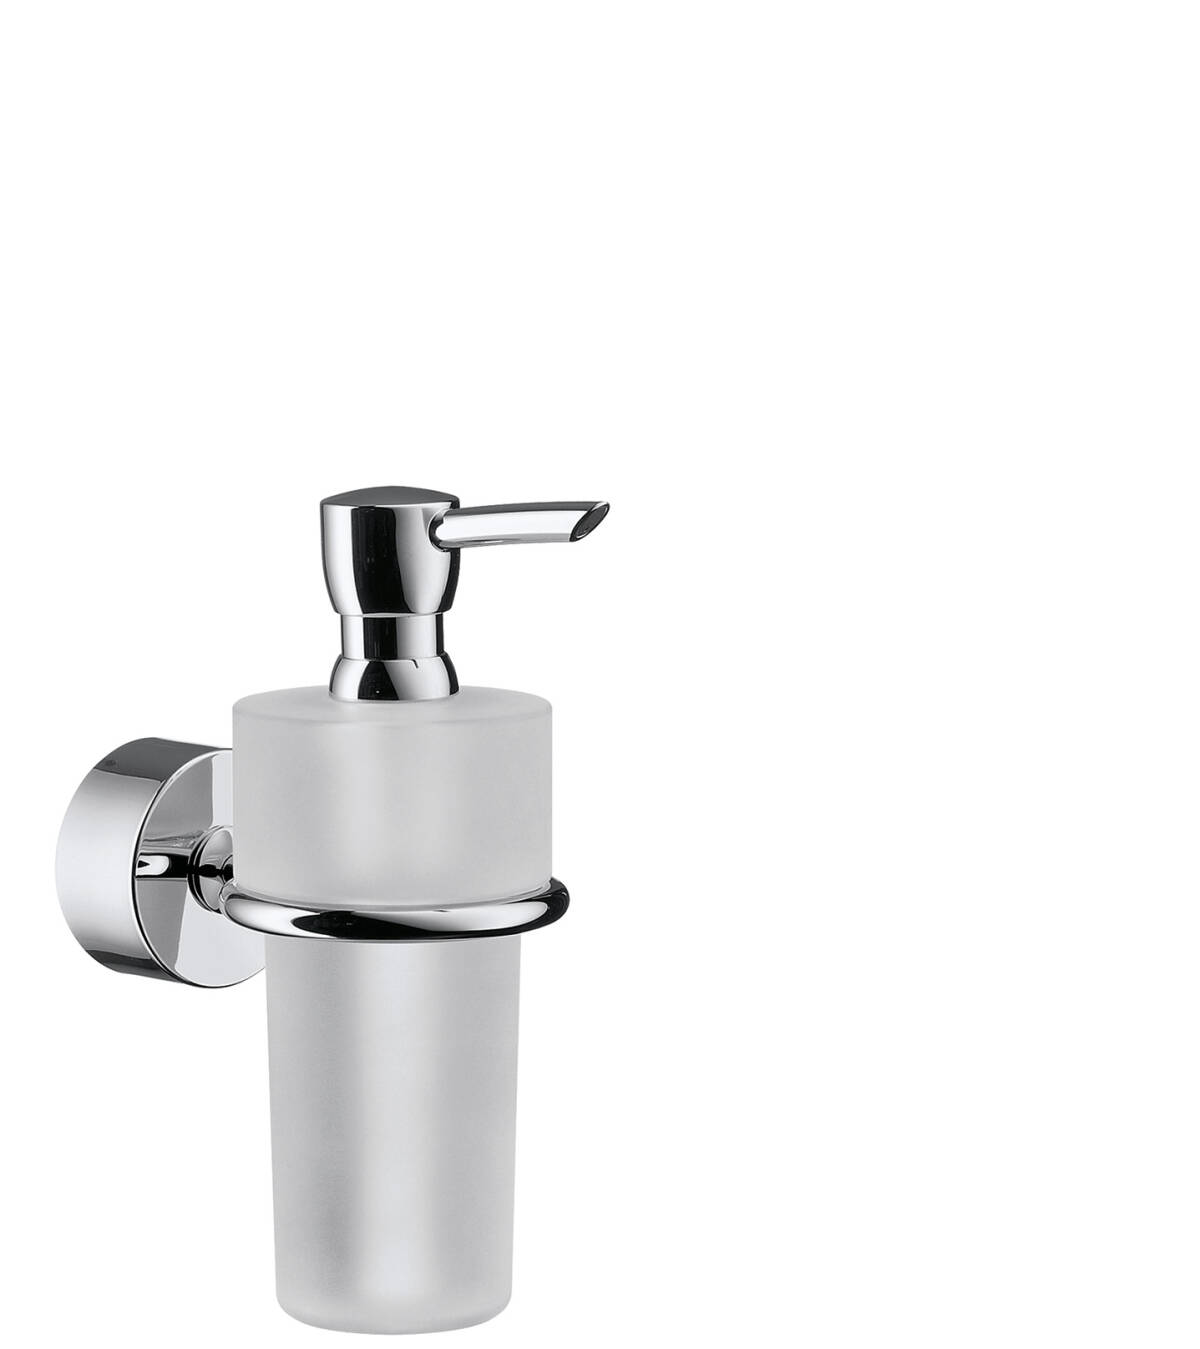 Liquid soap dispenser, Chrome, 41519000